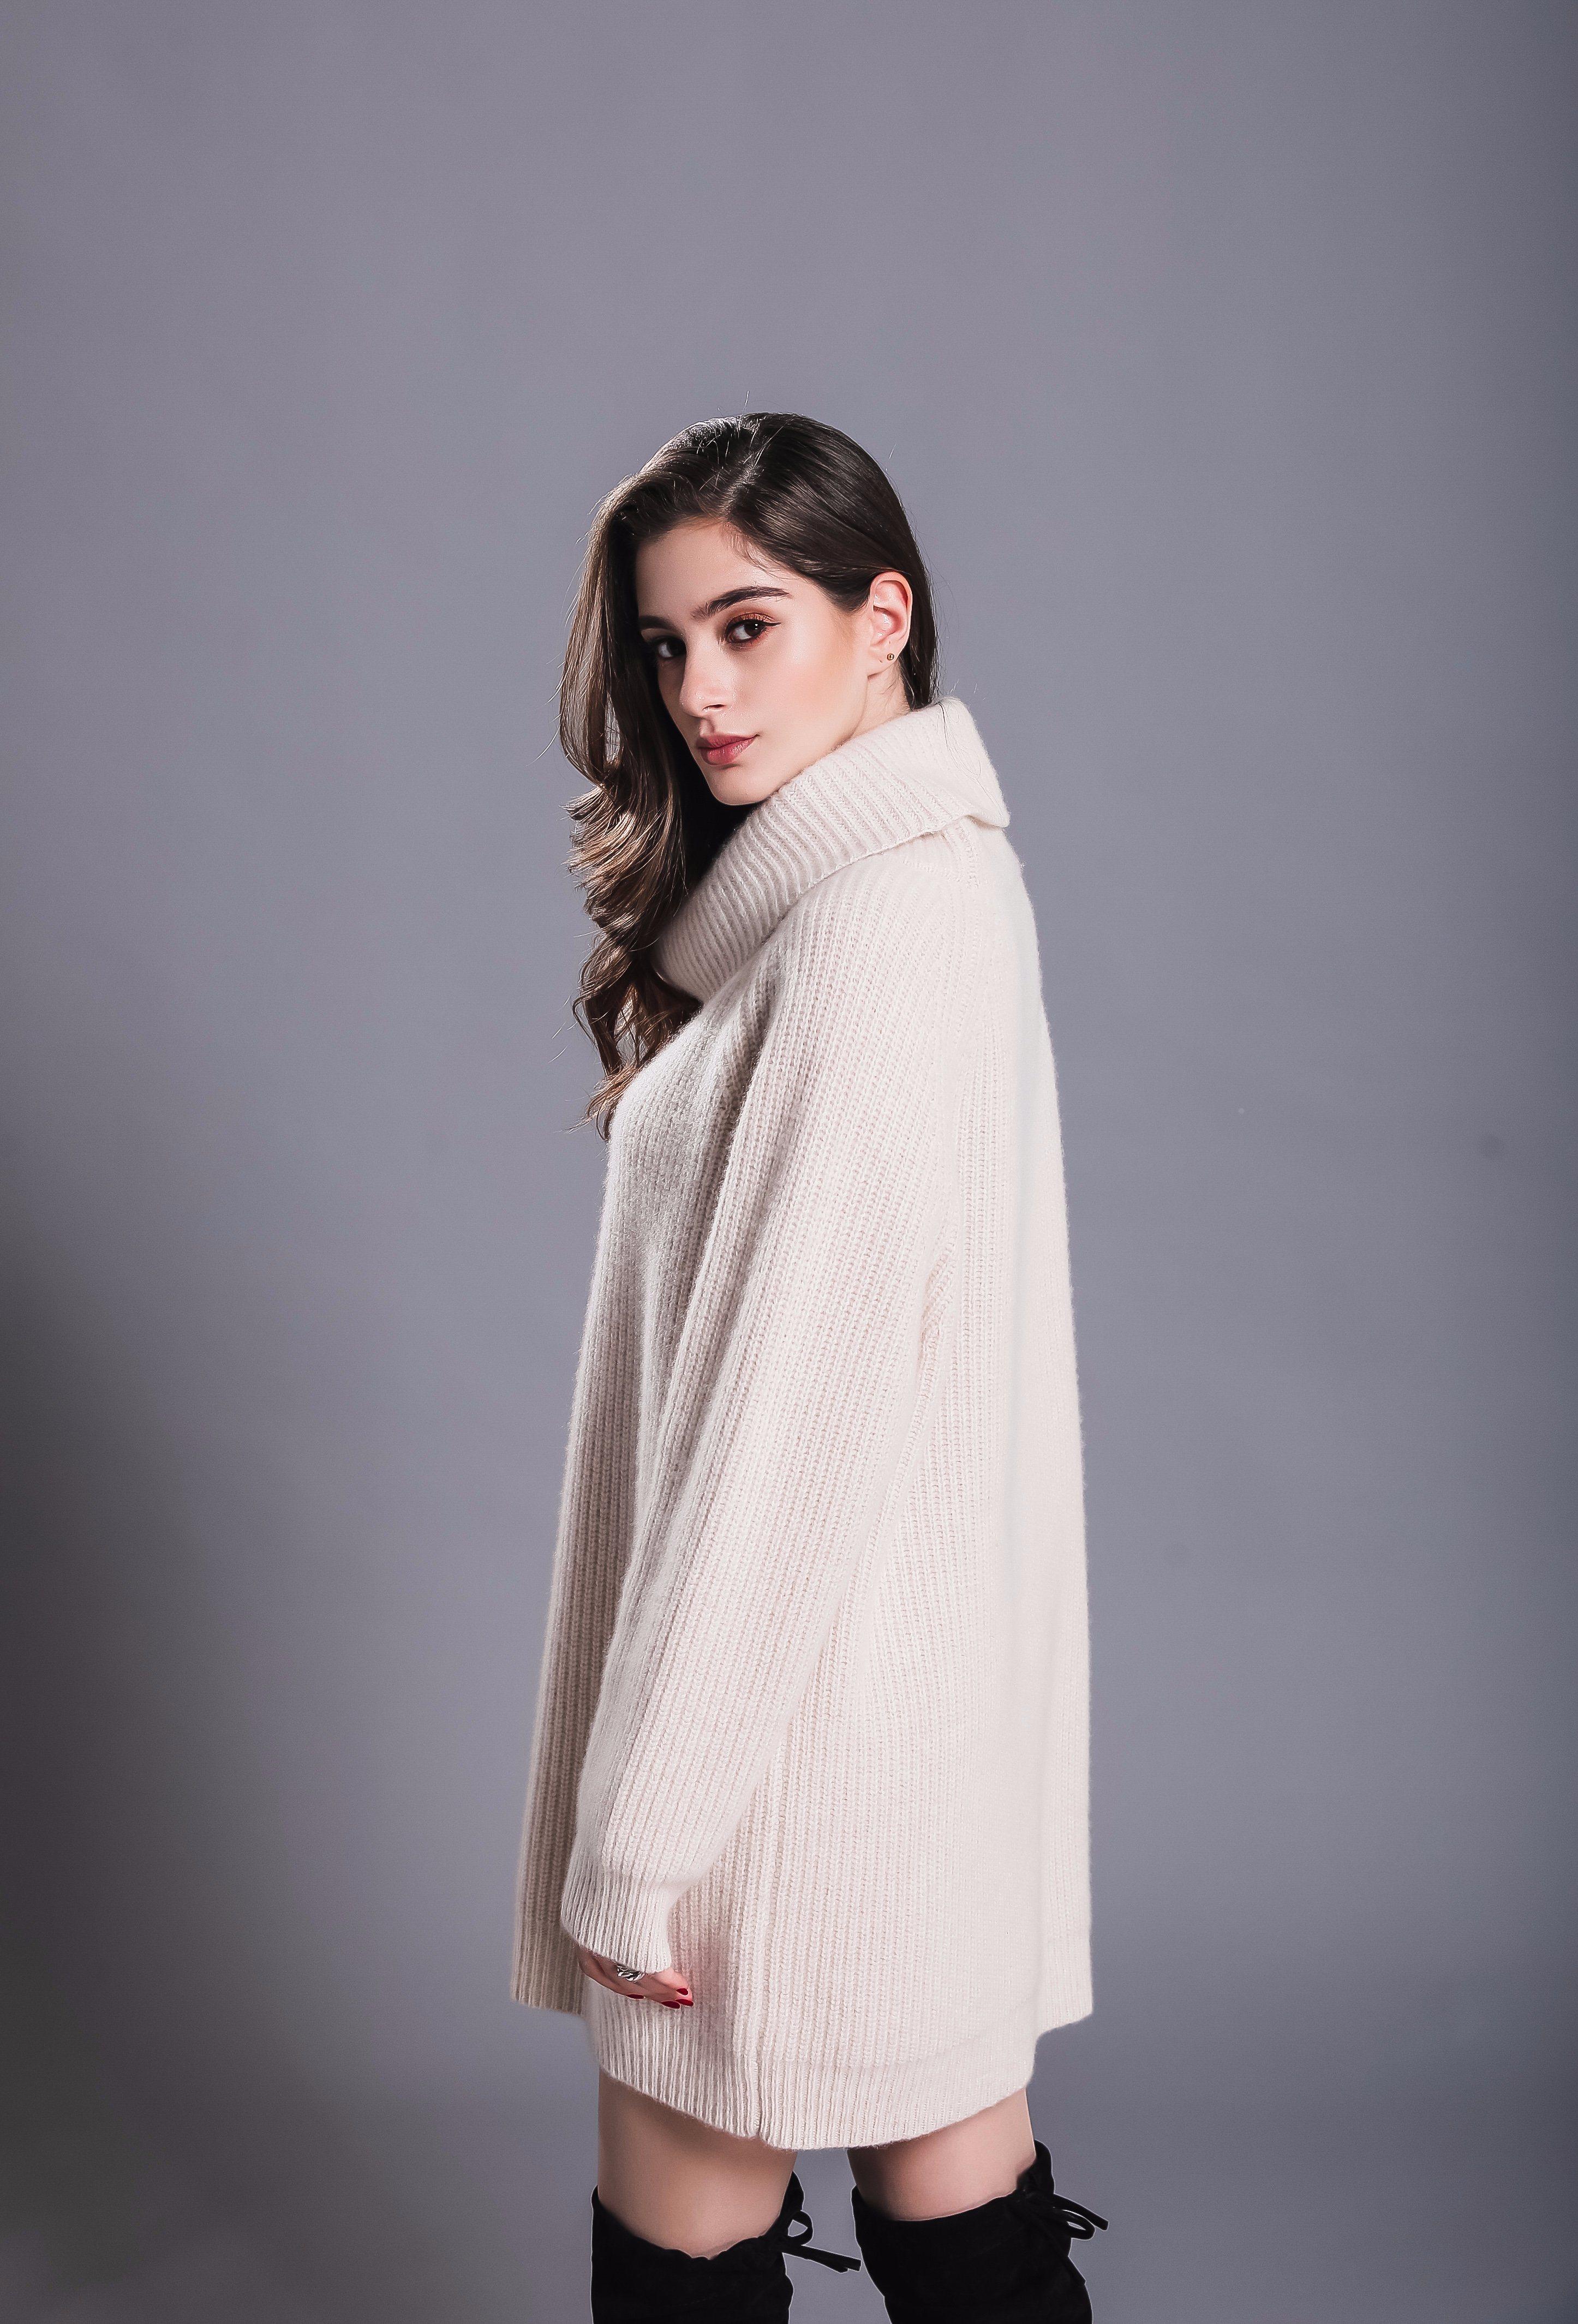 4b7e1dbe17a41 Wholesale Latest Fashion Clothes Women/Ladies Winter Wool Cashmere ...